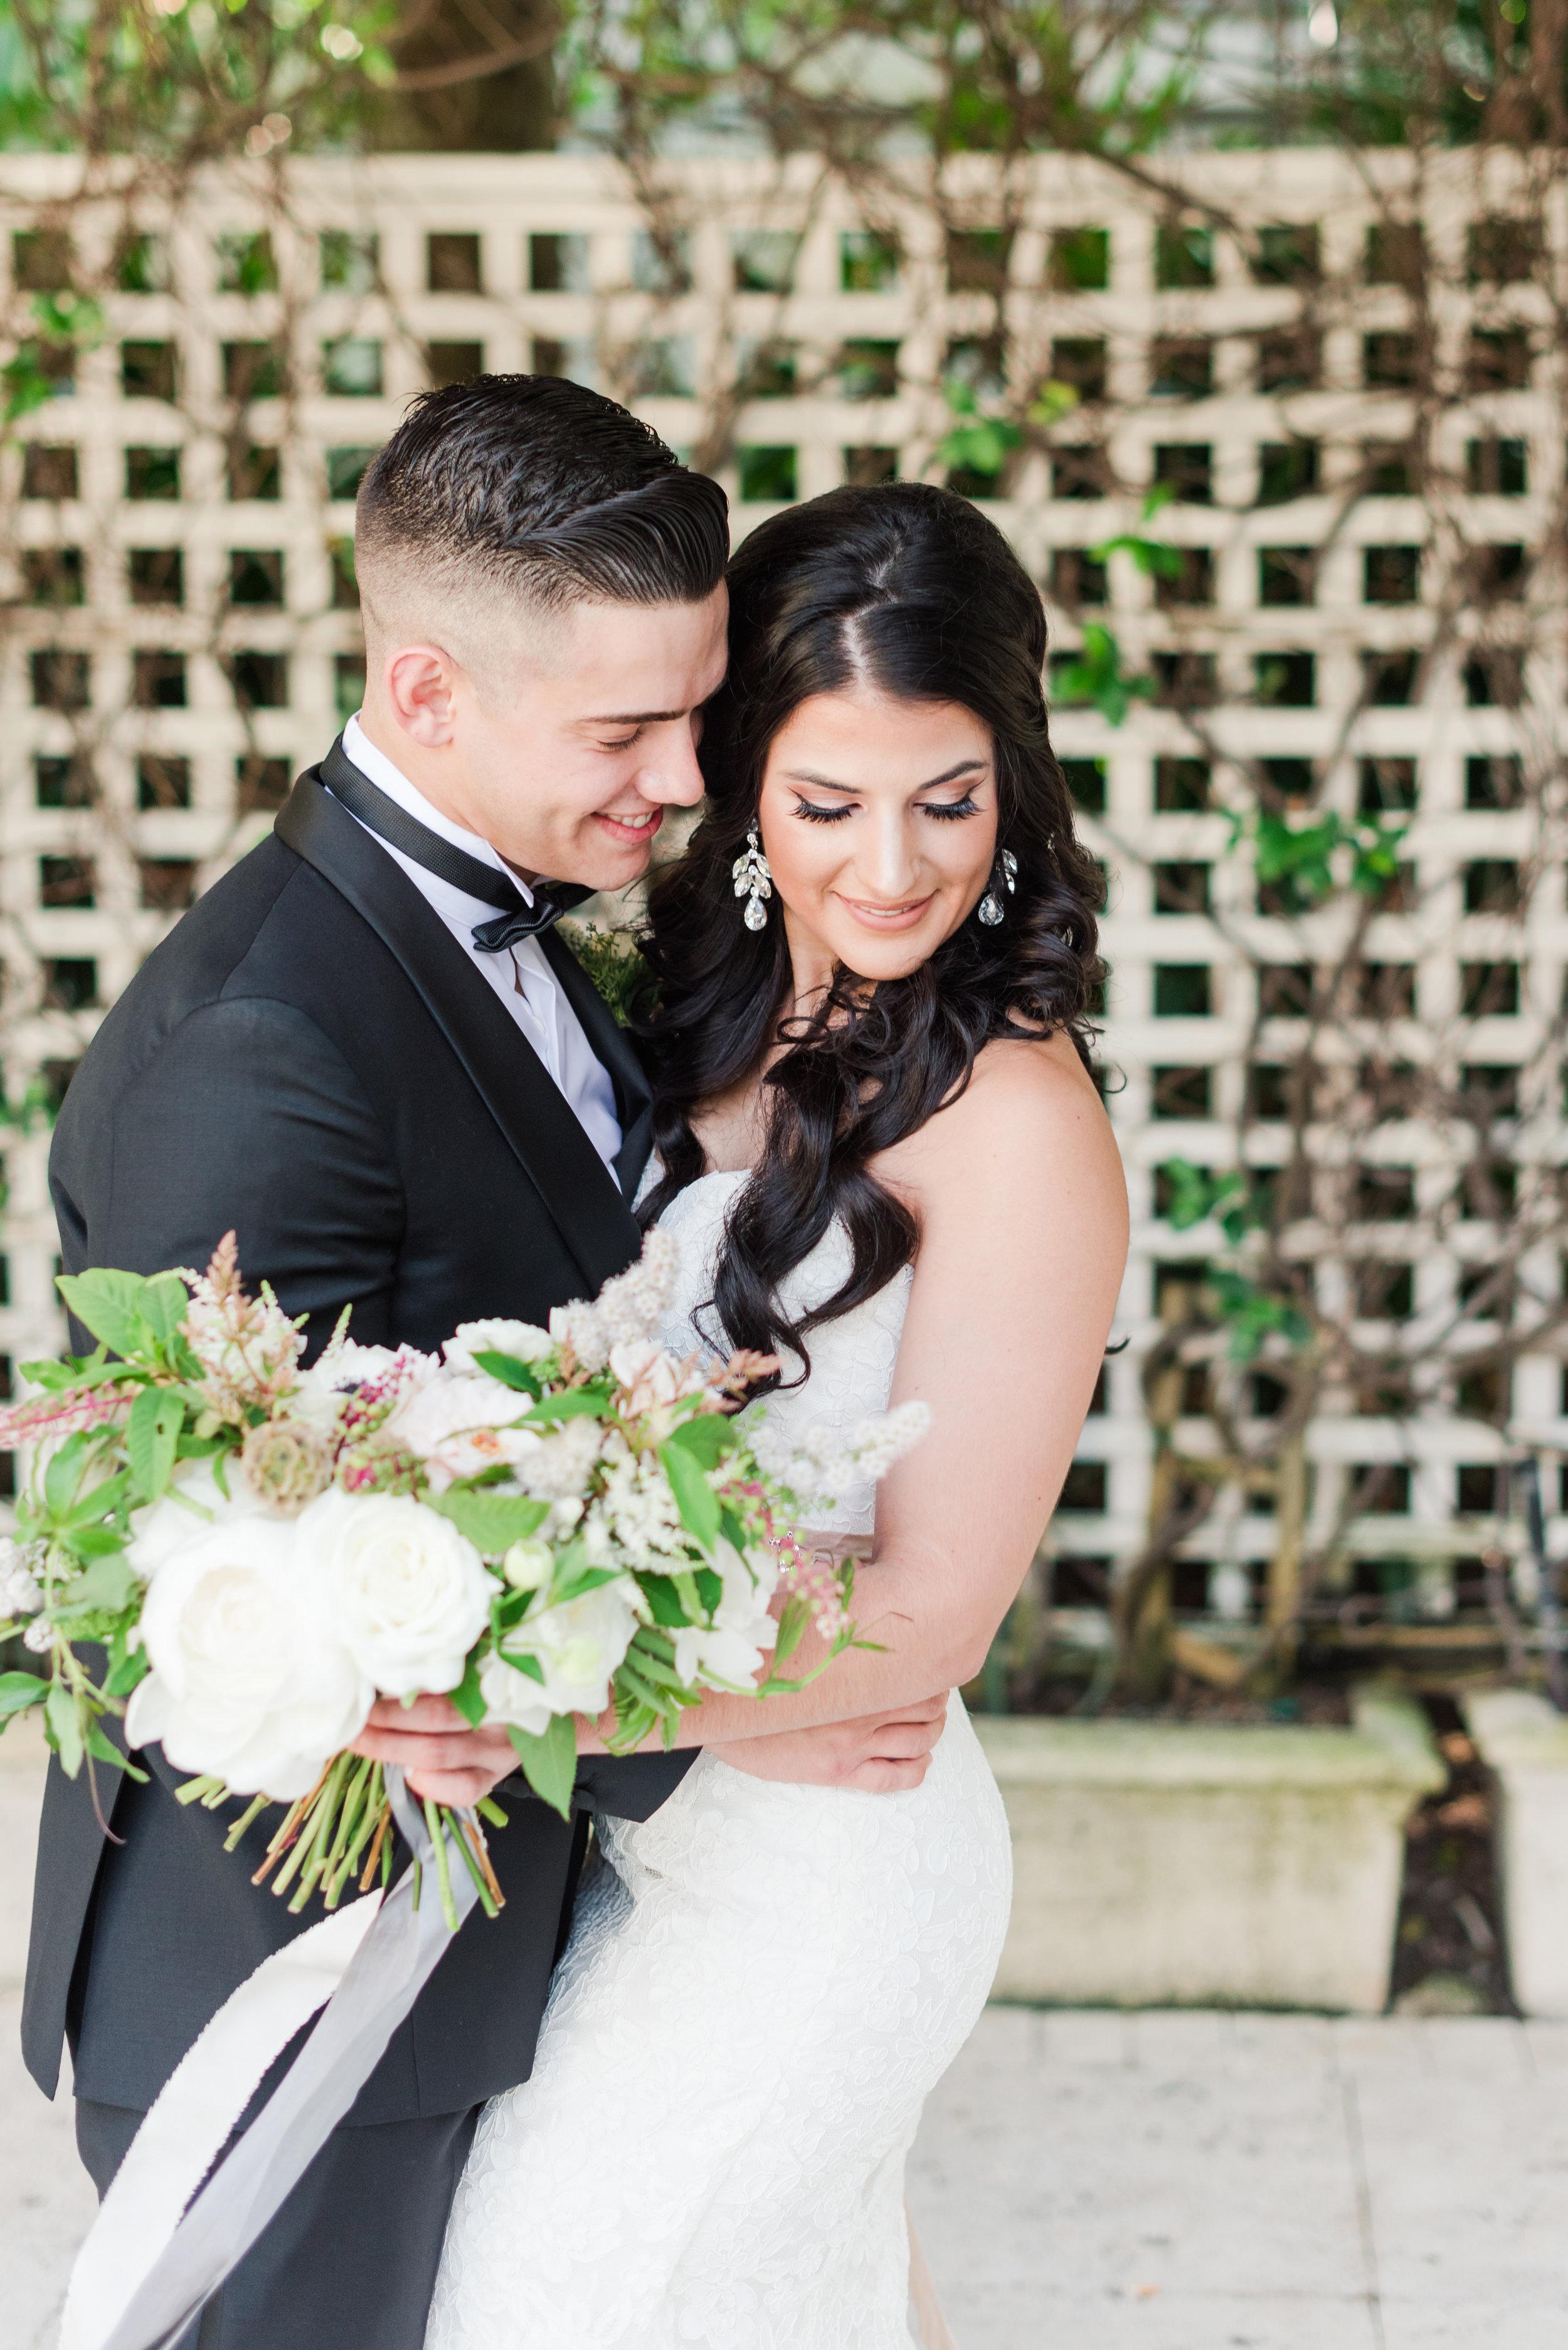 bridal-bouquet-ribbons